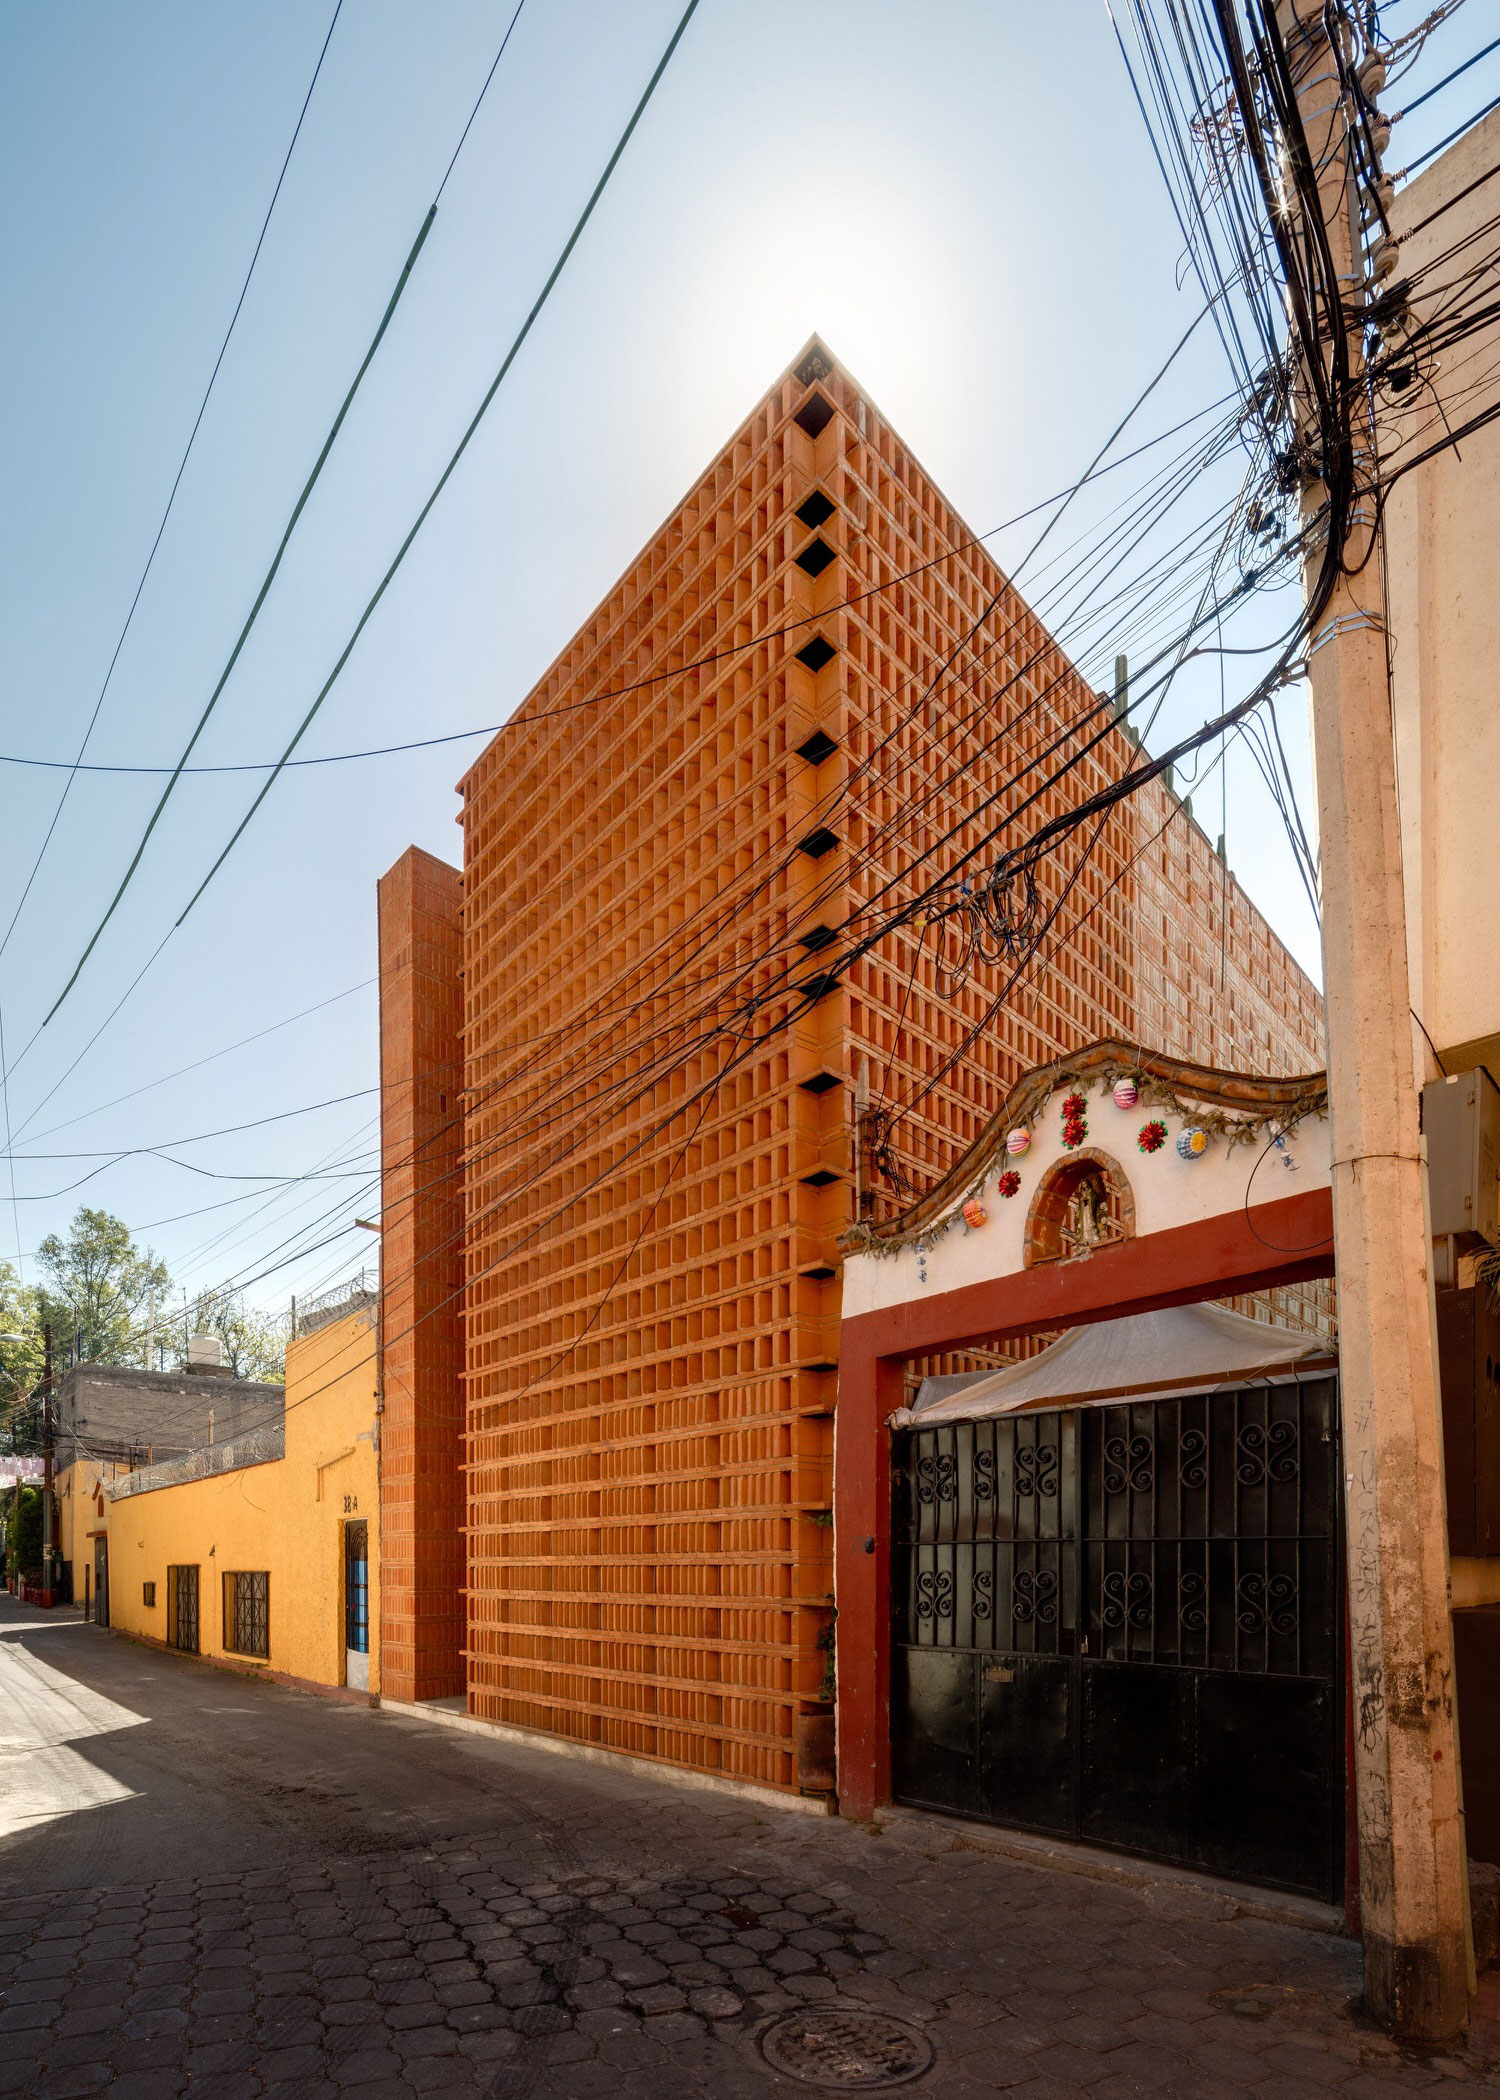 Iturbide Studio Mexico City Brick Architecture Taller Mauricio Rocha Gabriela Carrillo Yellowtrace 01